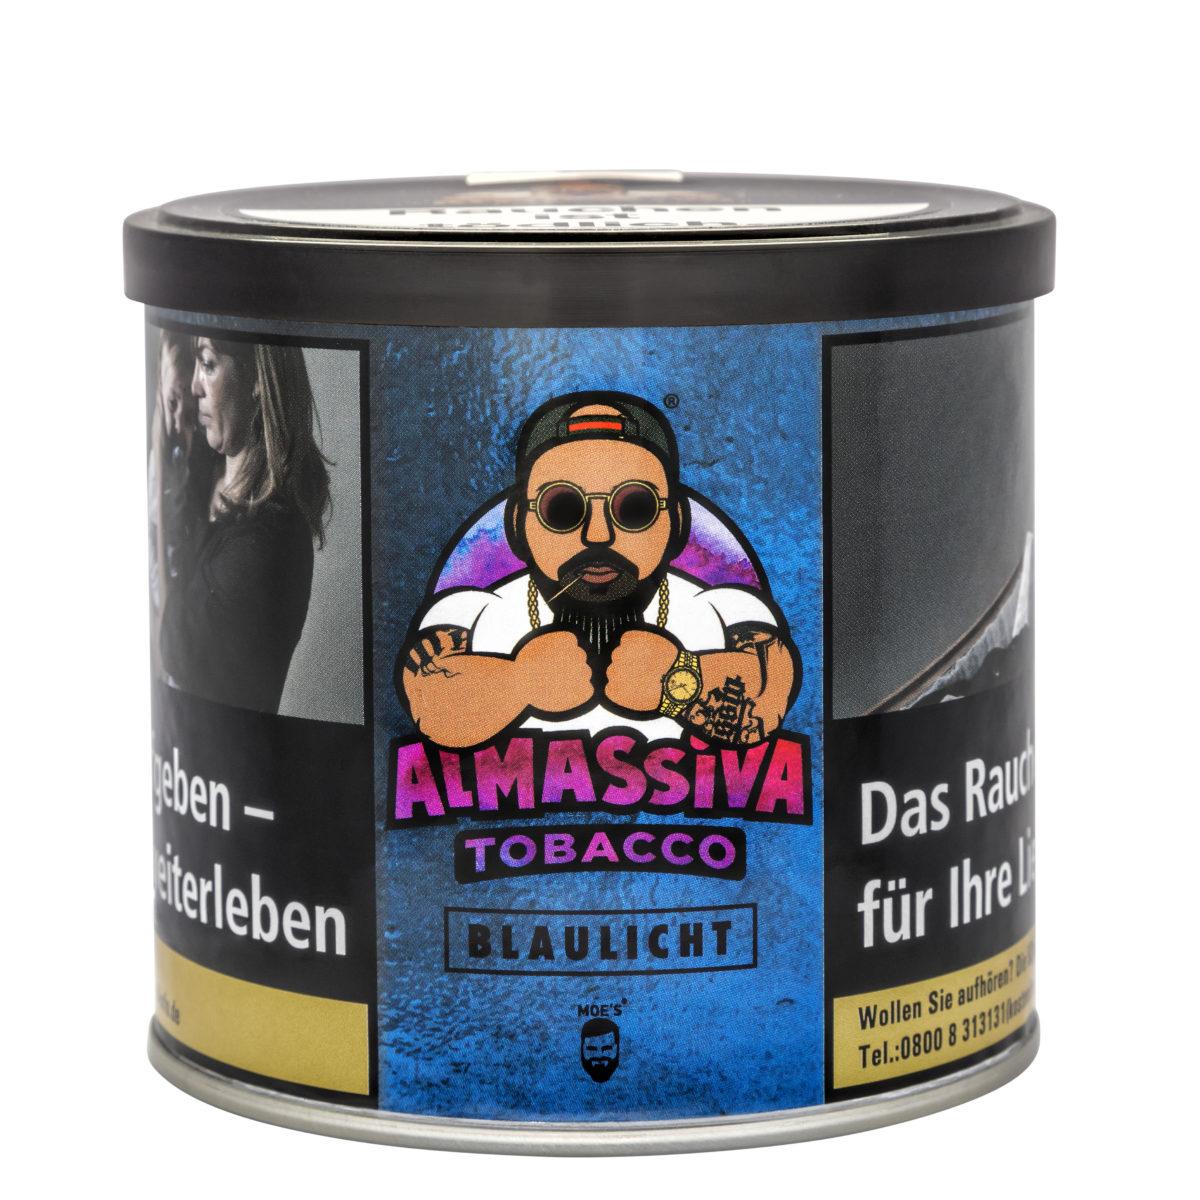 ALMASSIVA Tobacco - Blaulicht